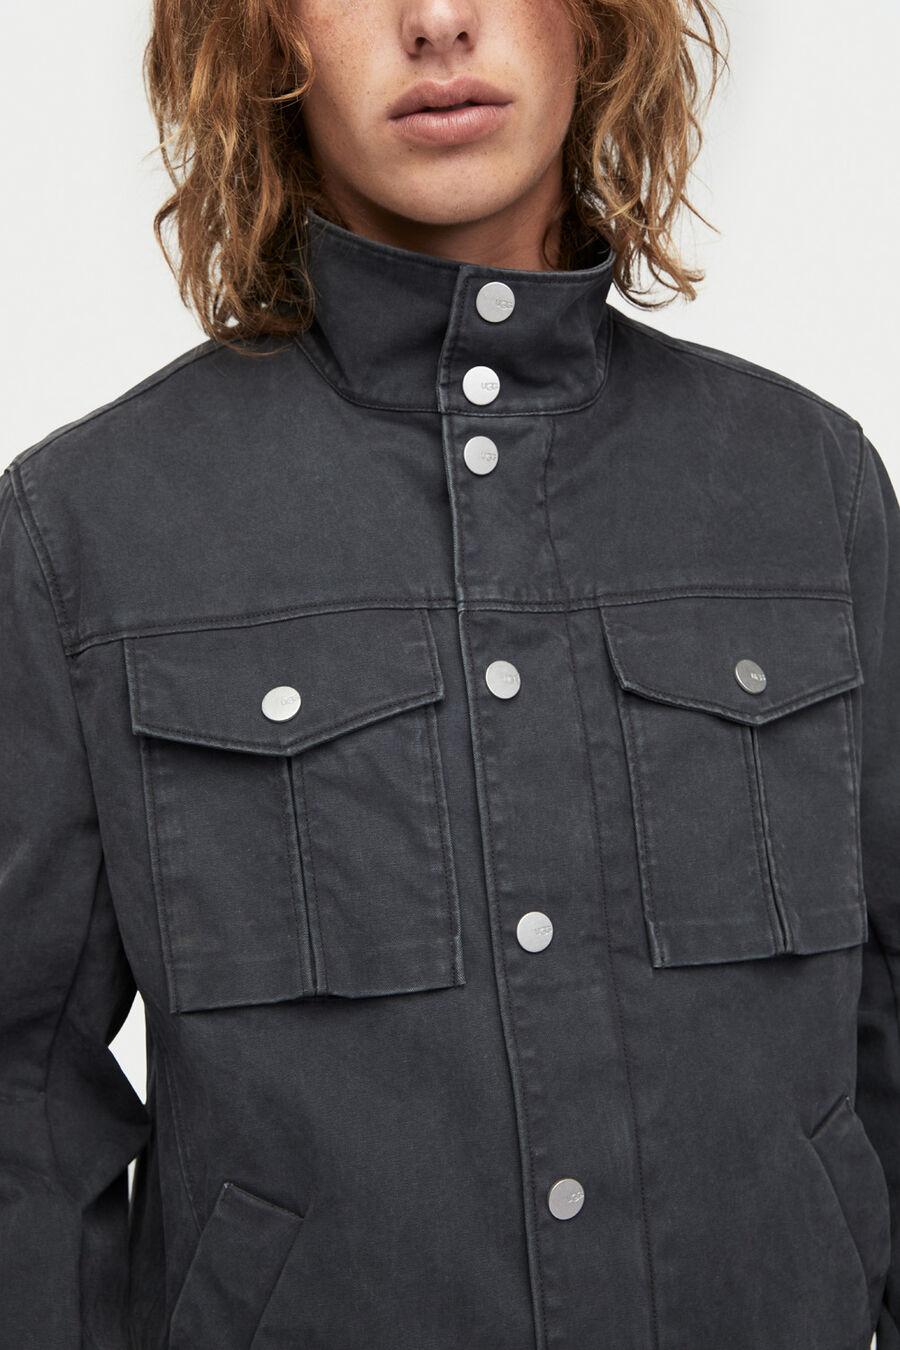 Cohen Waxed Cotton Jacket - Image 4 of 4